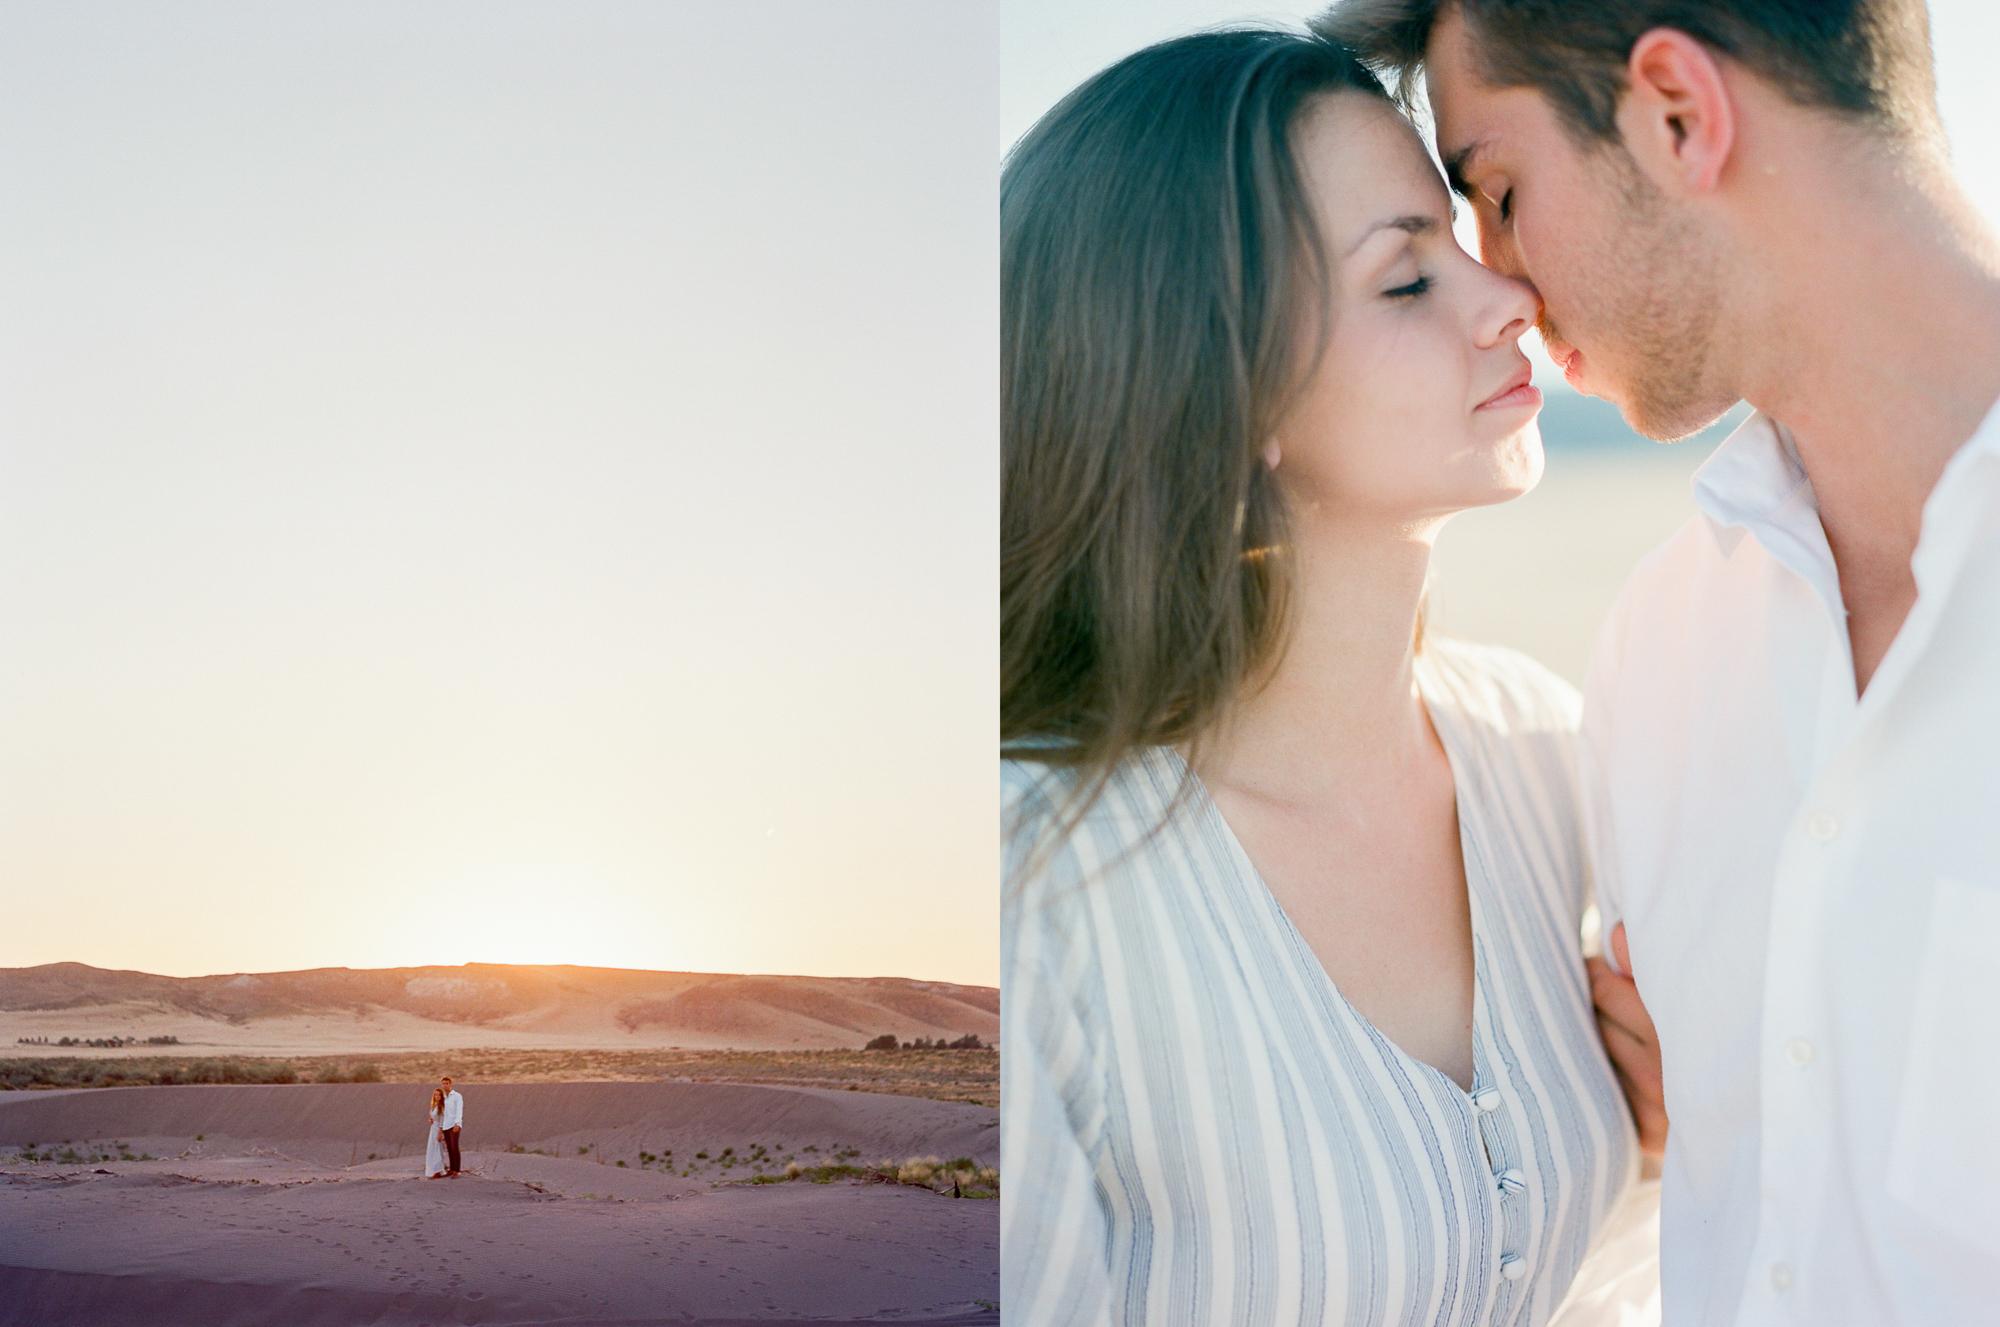 charlotte-charleston-wedding-family-film-destination-photographer-bruneau-sand-dunes-boise-idaho-5.jpg